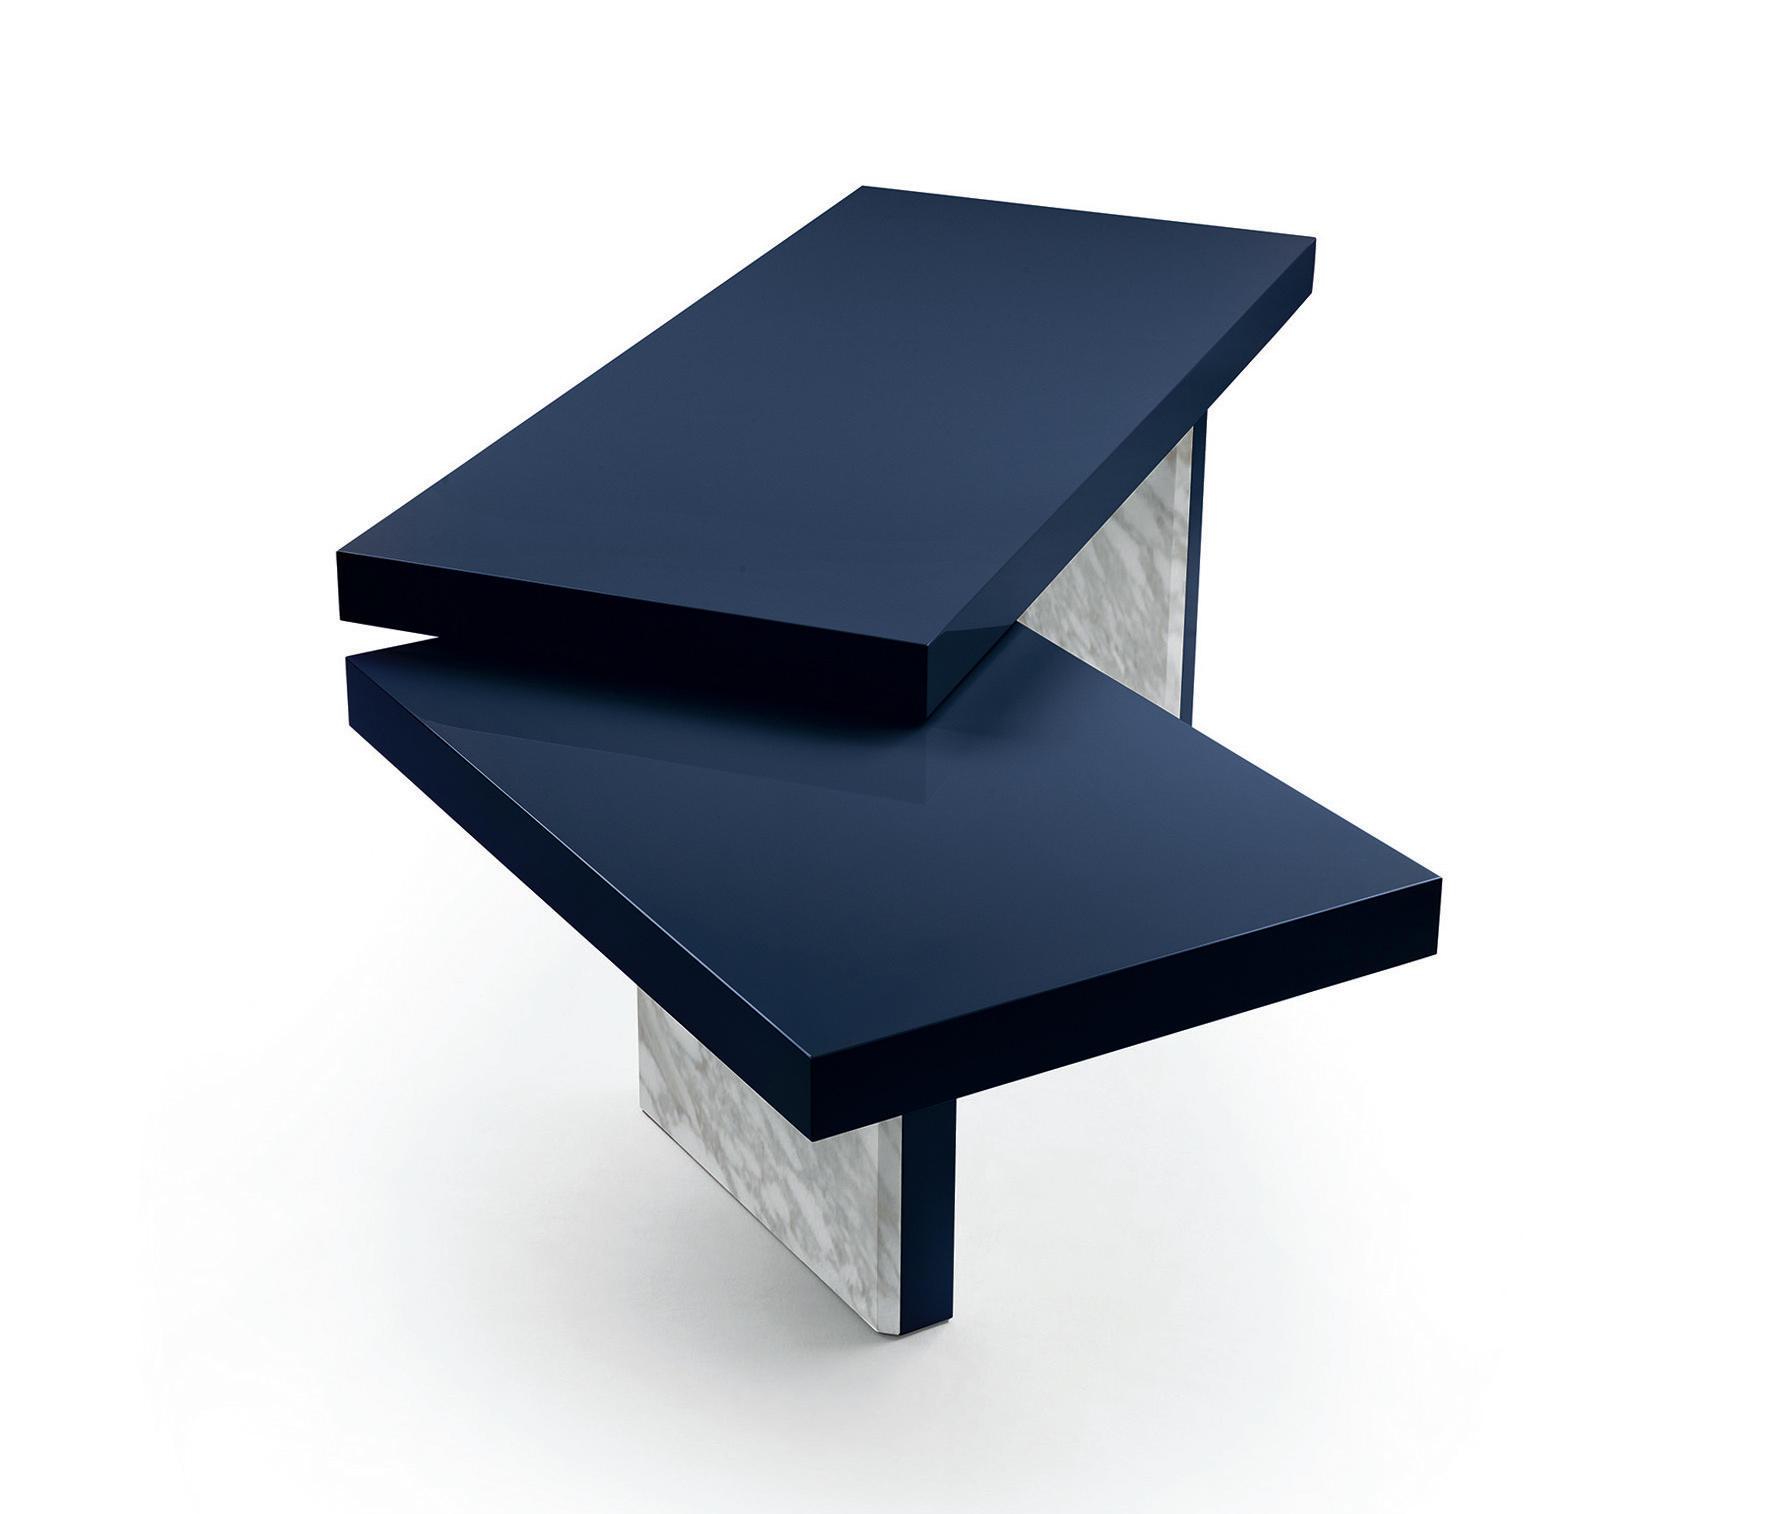 Benjamin By Flexform Mood | Desks Benjamin By Flexform Mood | Desks